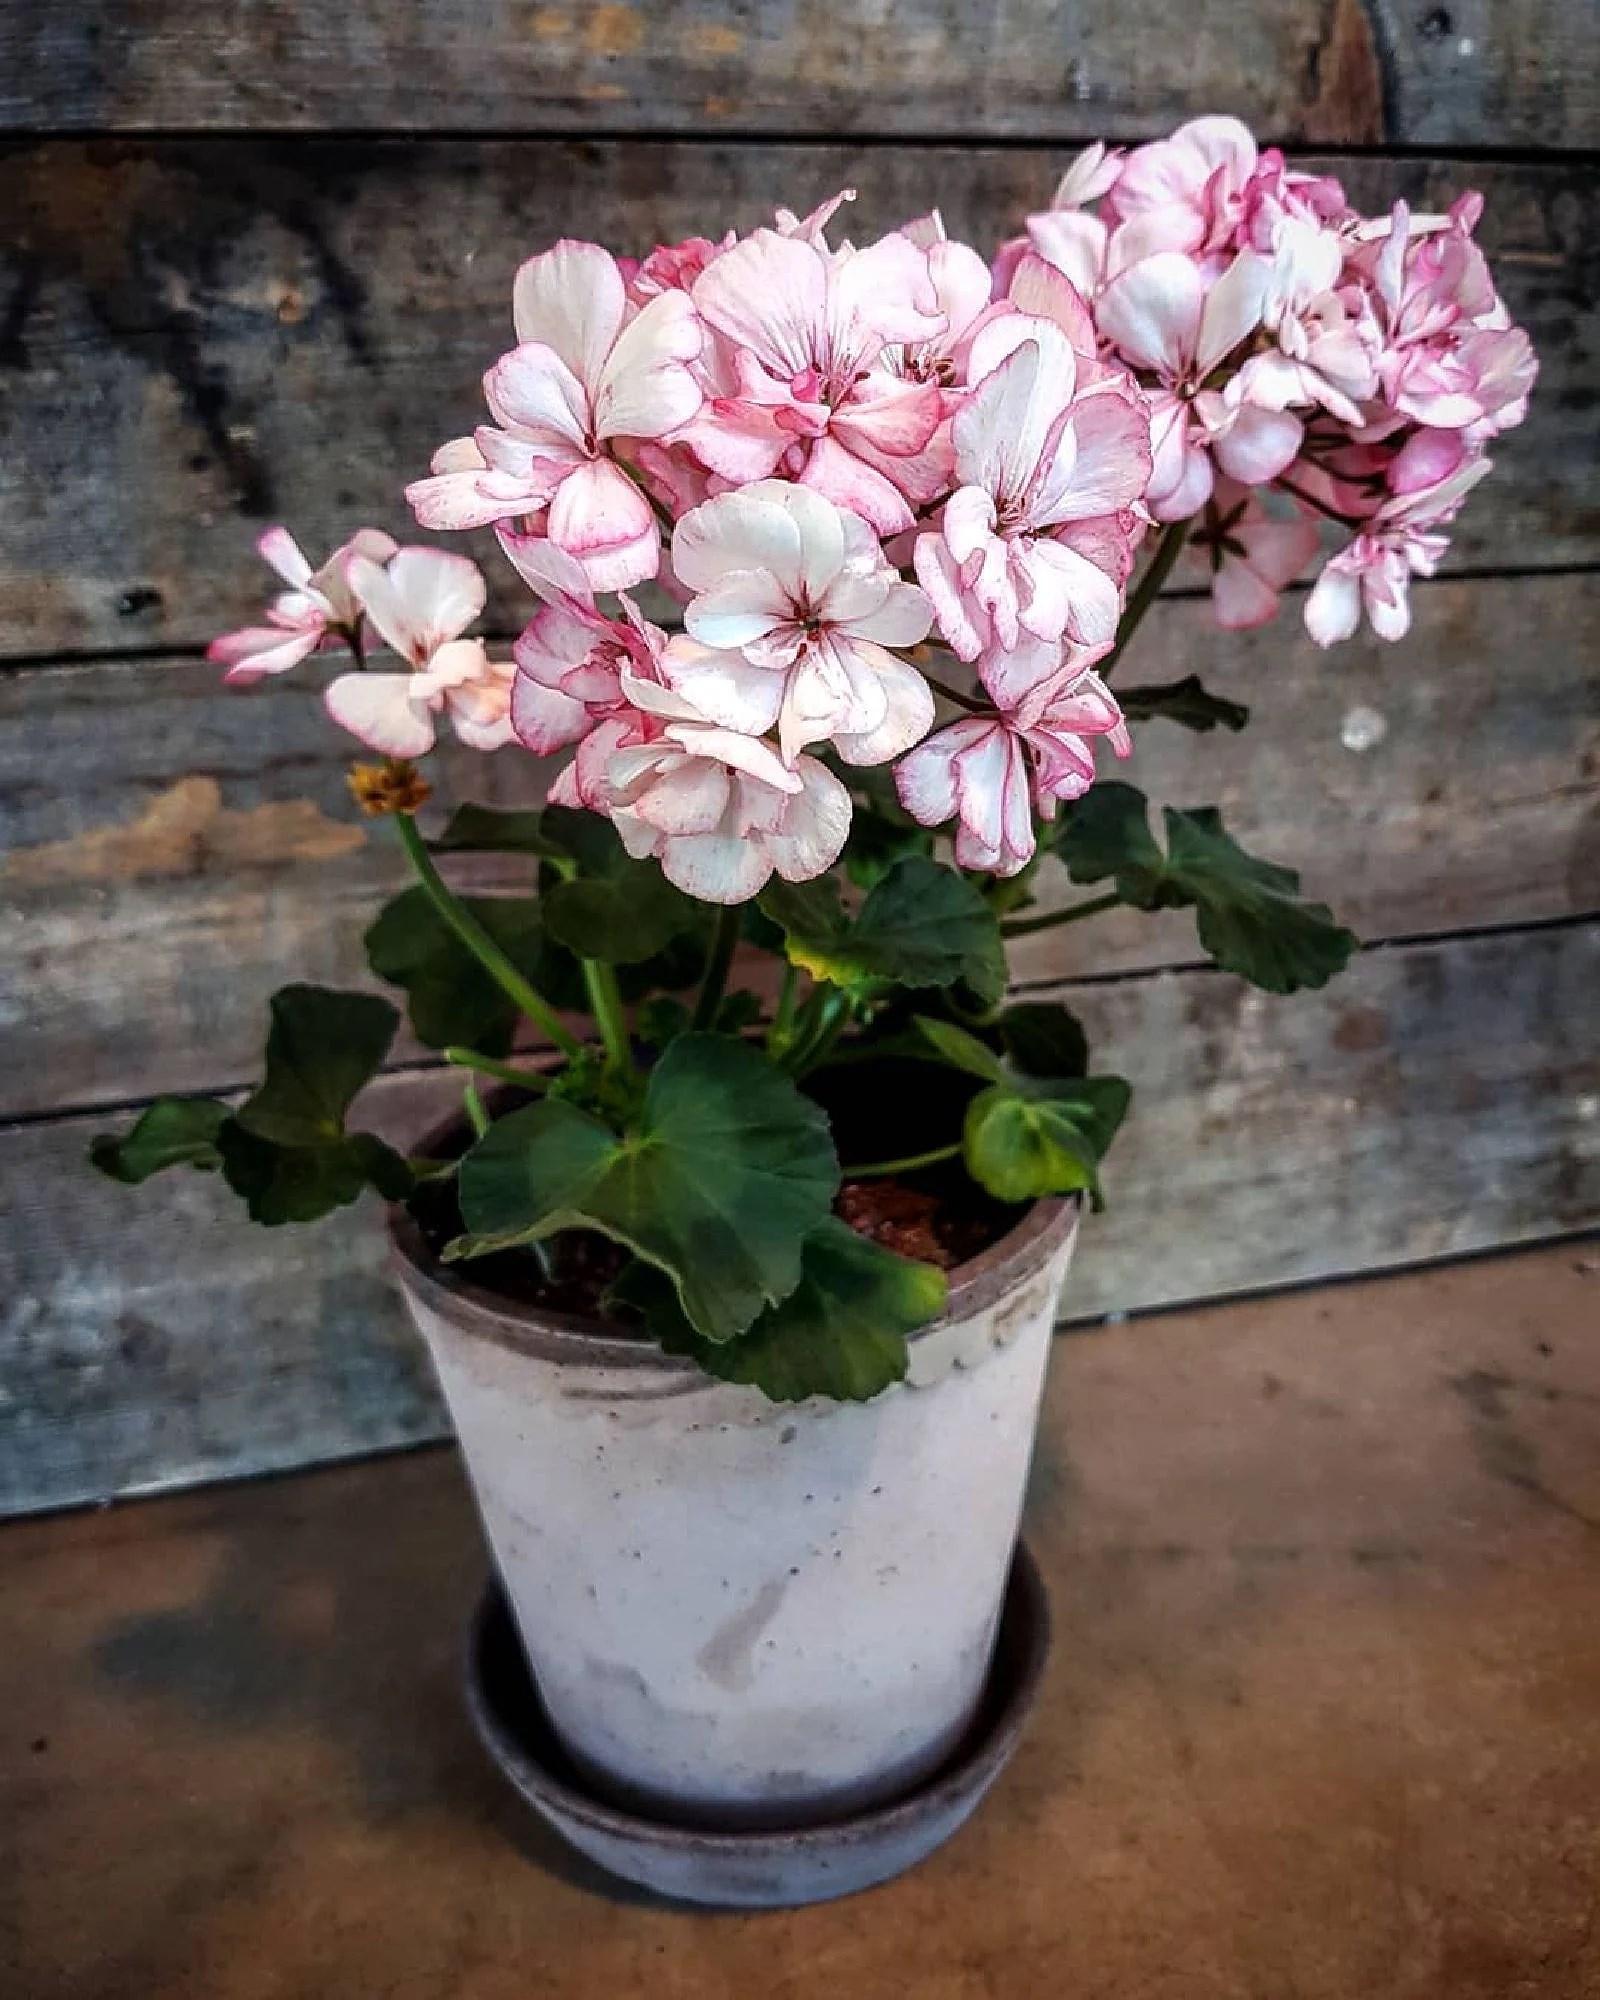 Picotee Pink